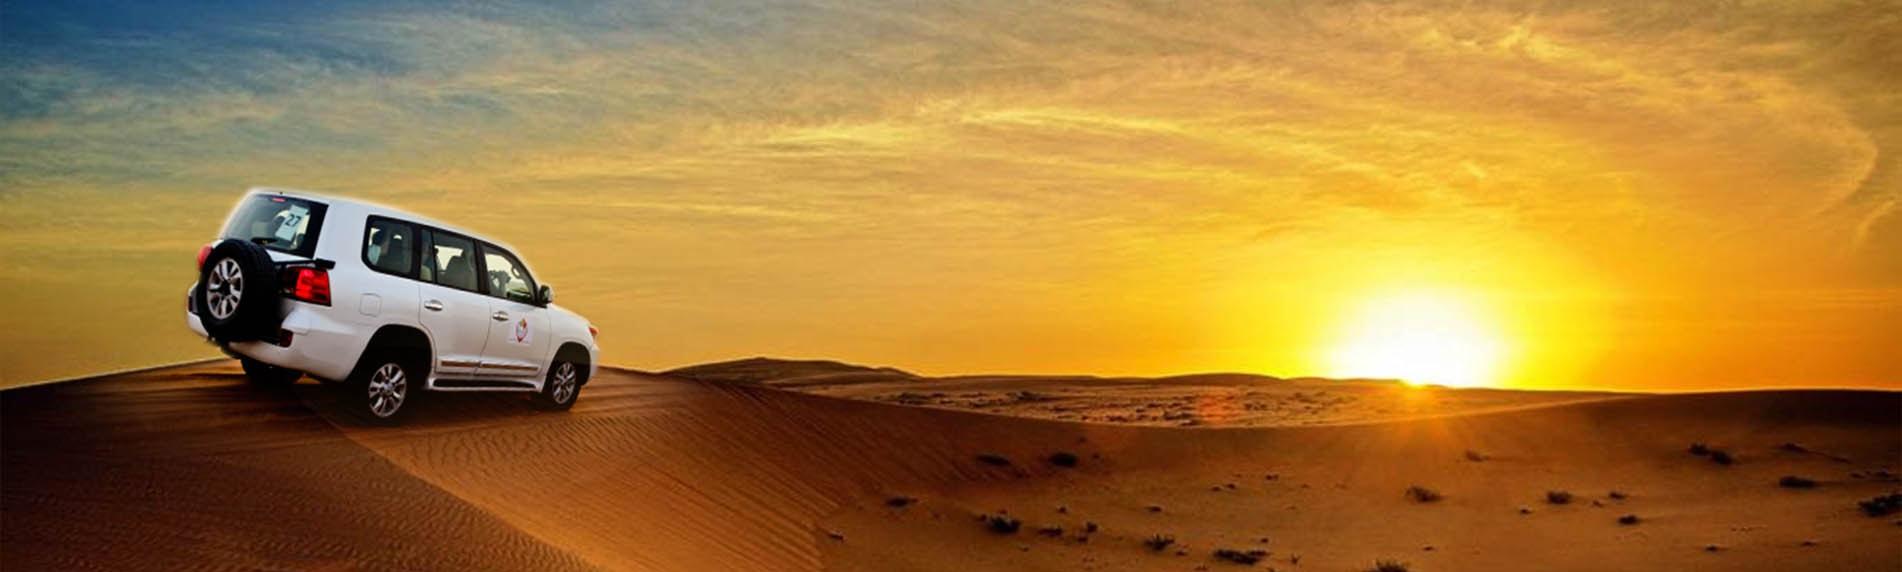 Sunrise Safari Dubai